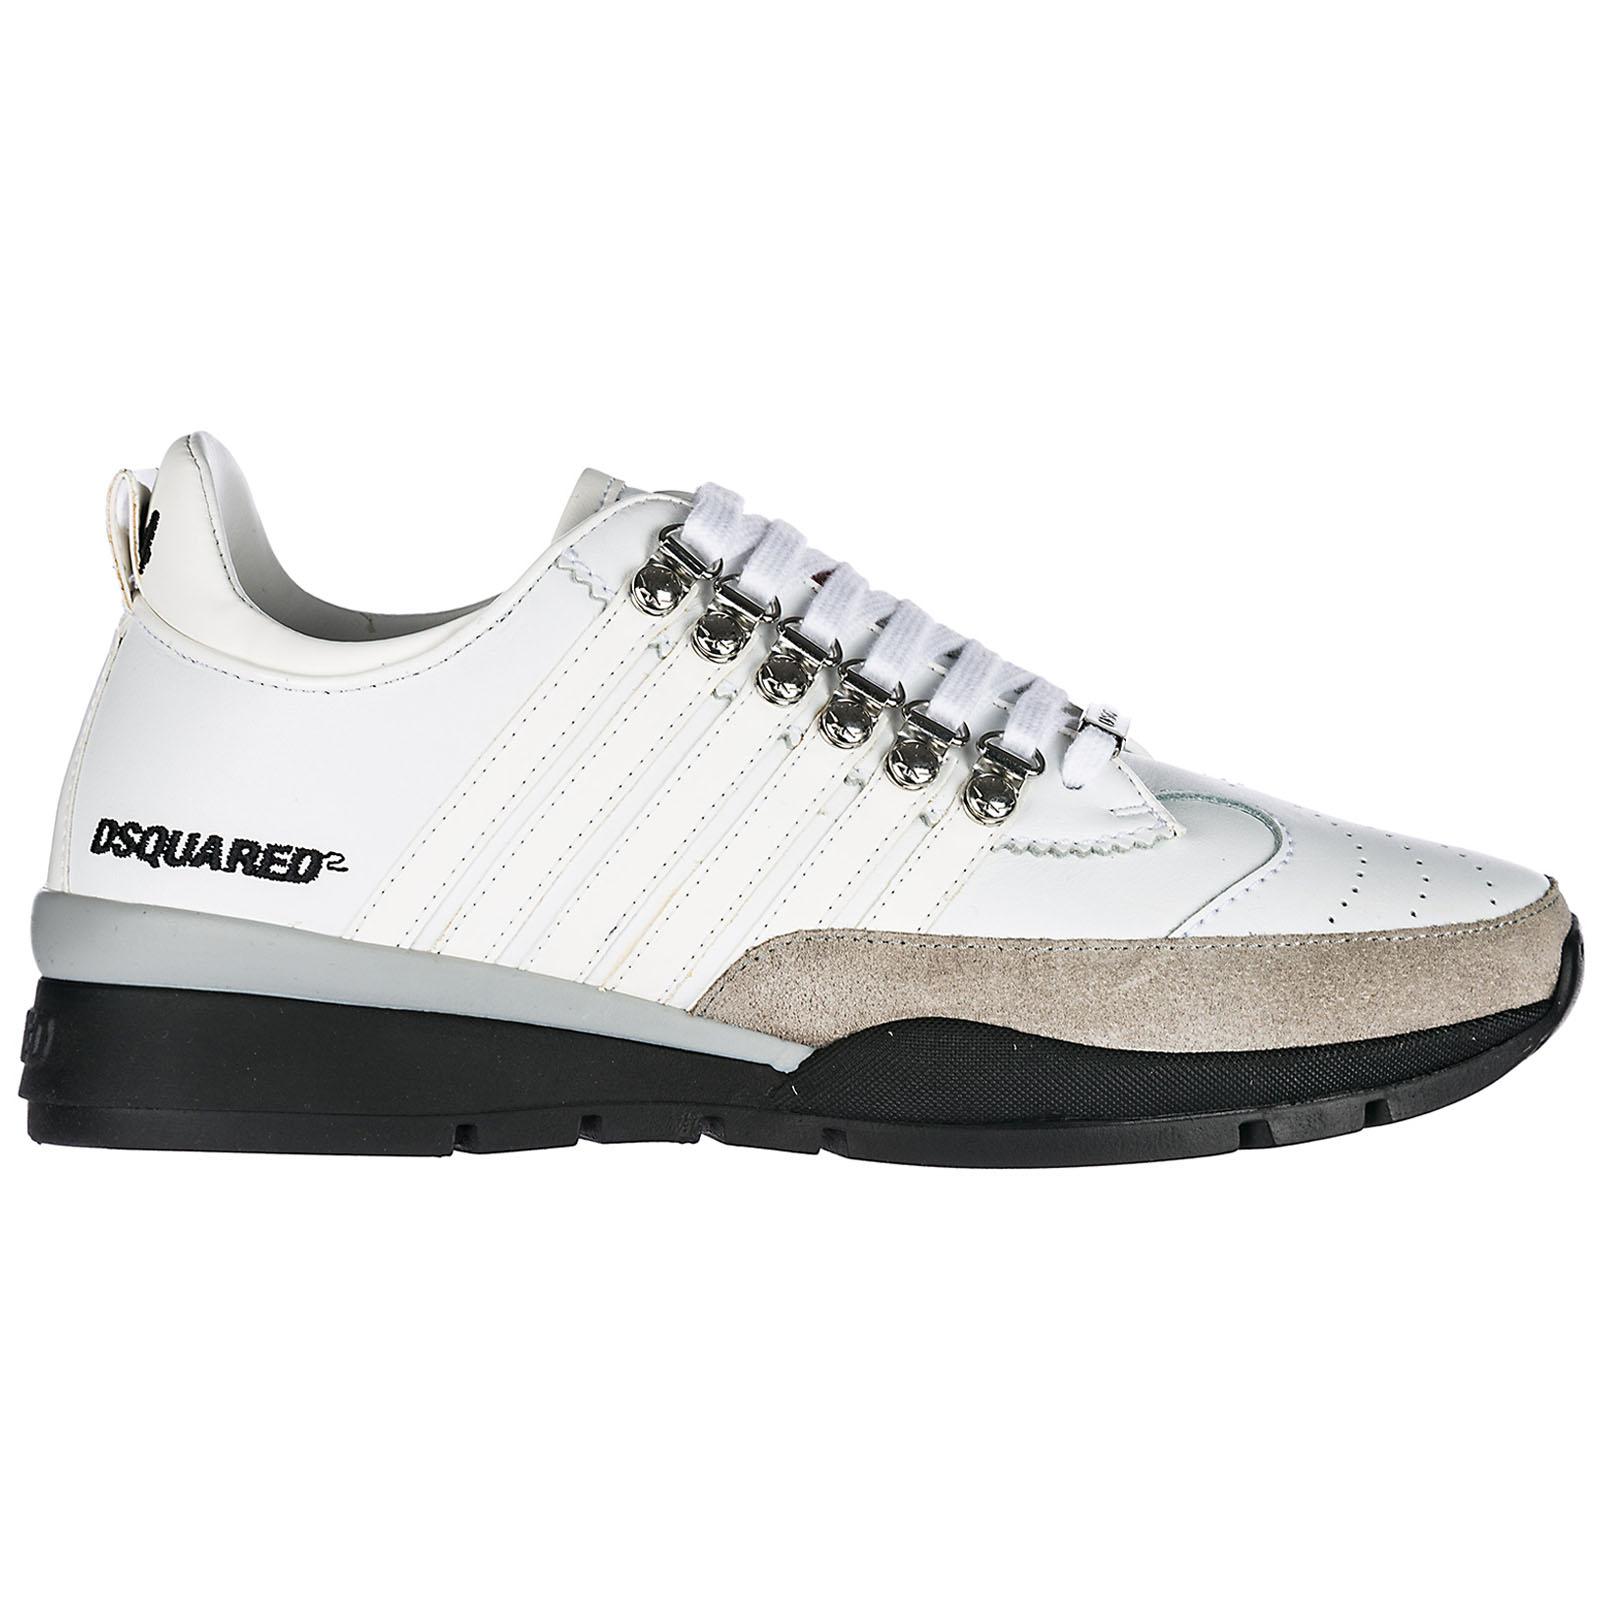 3d1e043b2d1cf Sneakers Dsquared2 251 SNM010111570001M1048 bianco   FRMODA.com